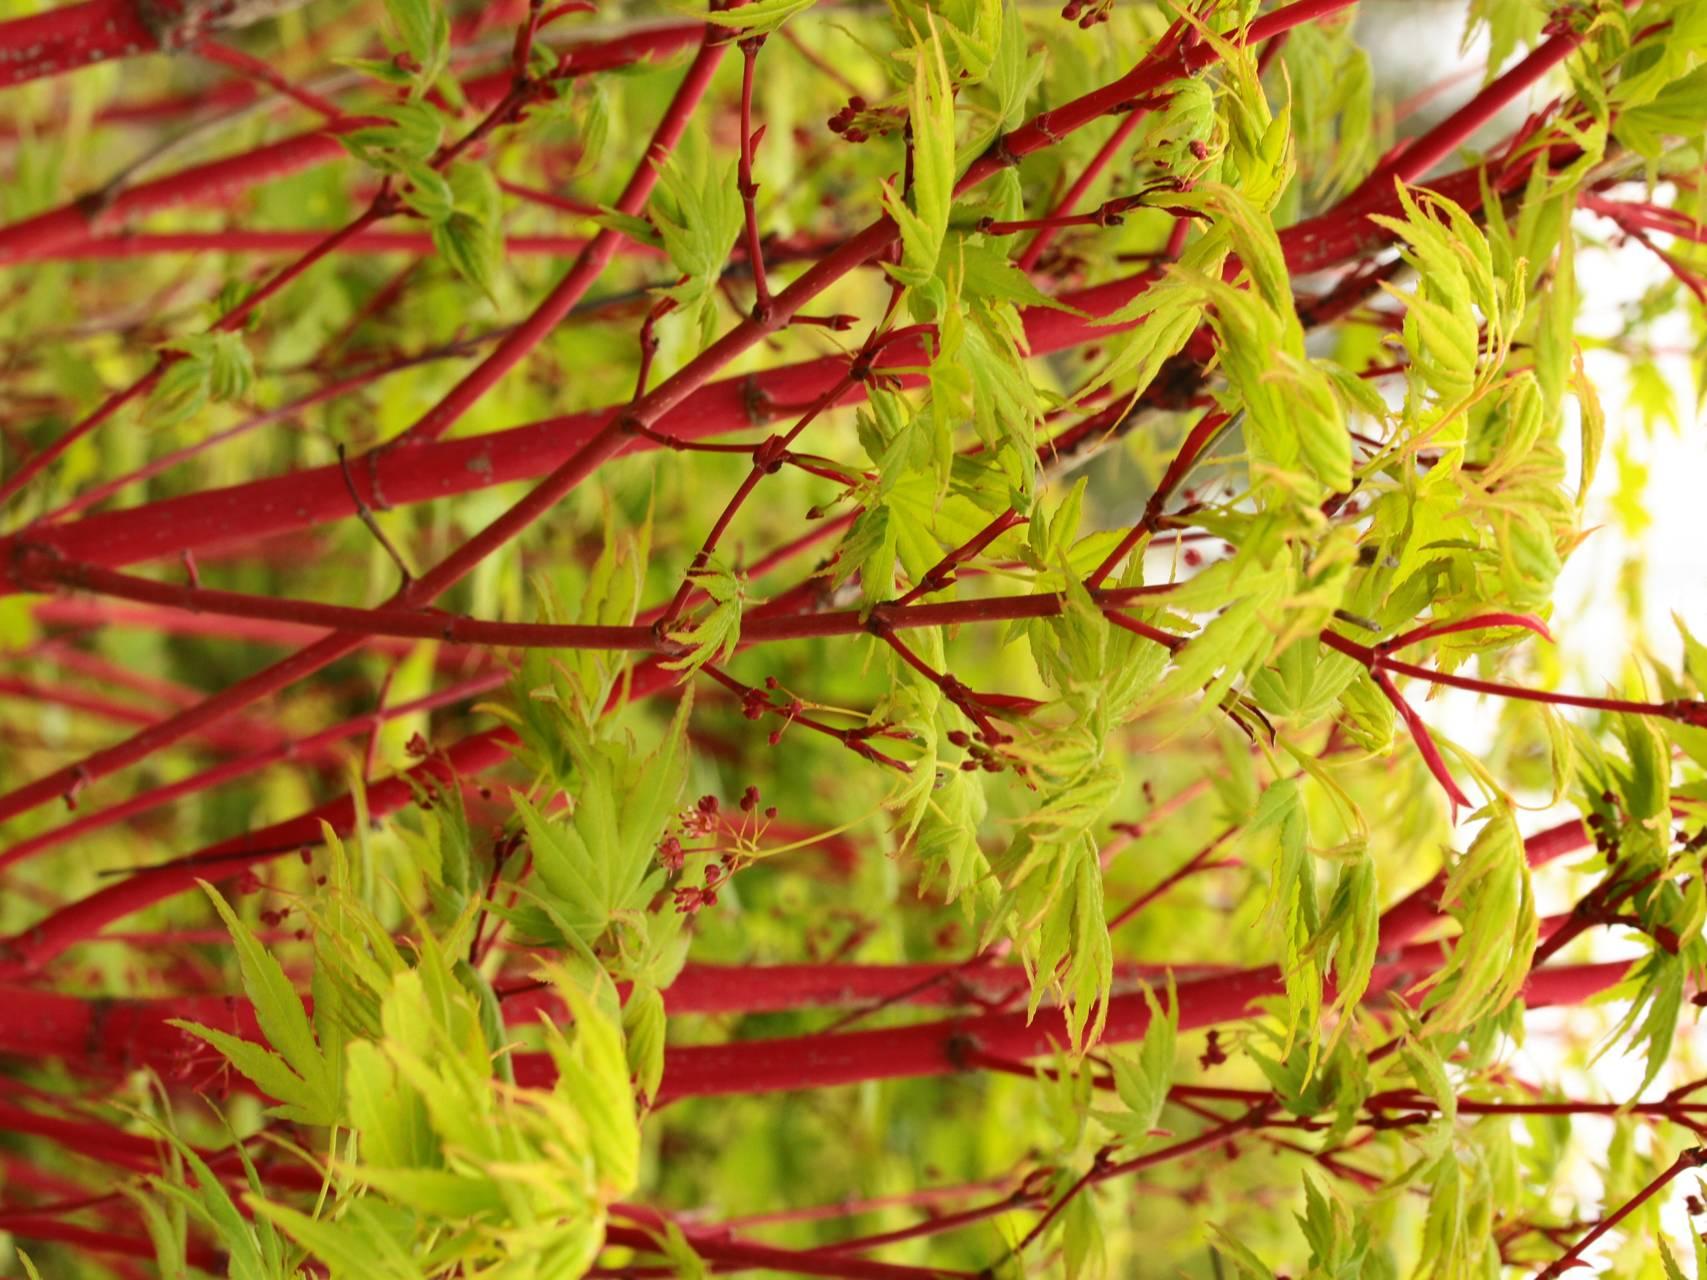 Acer palmatum Sango kaku Japanese maple coral red bark color